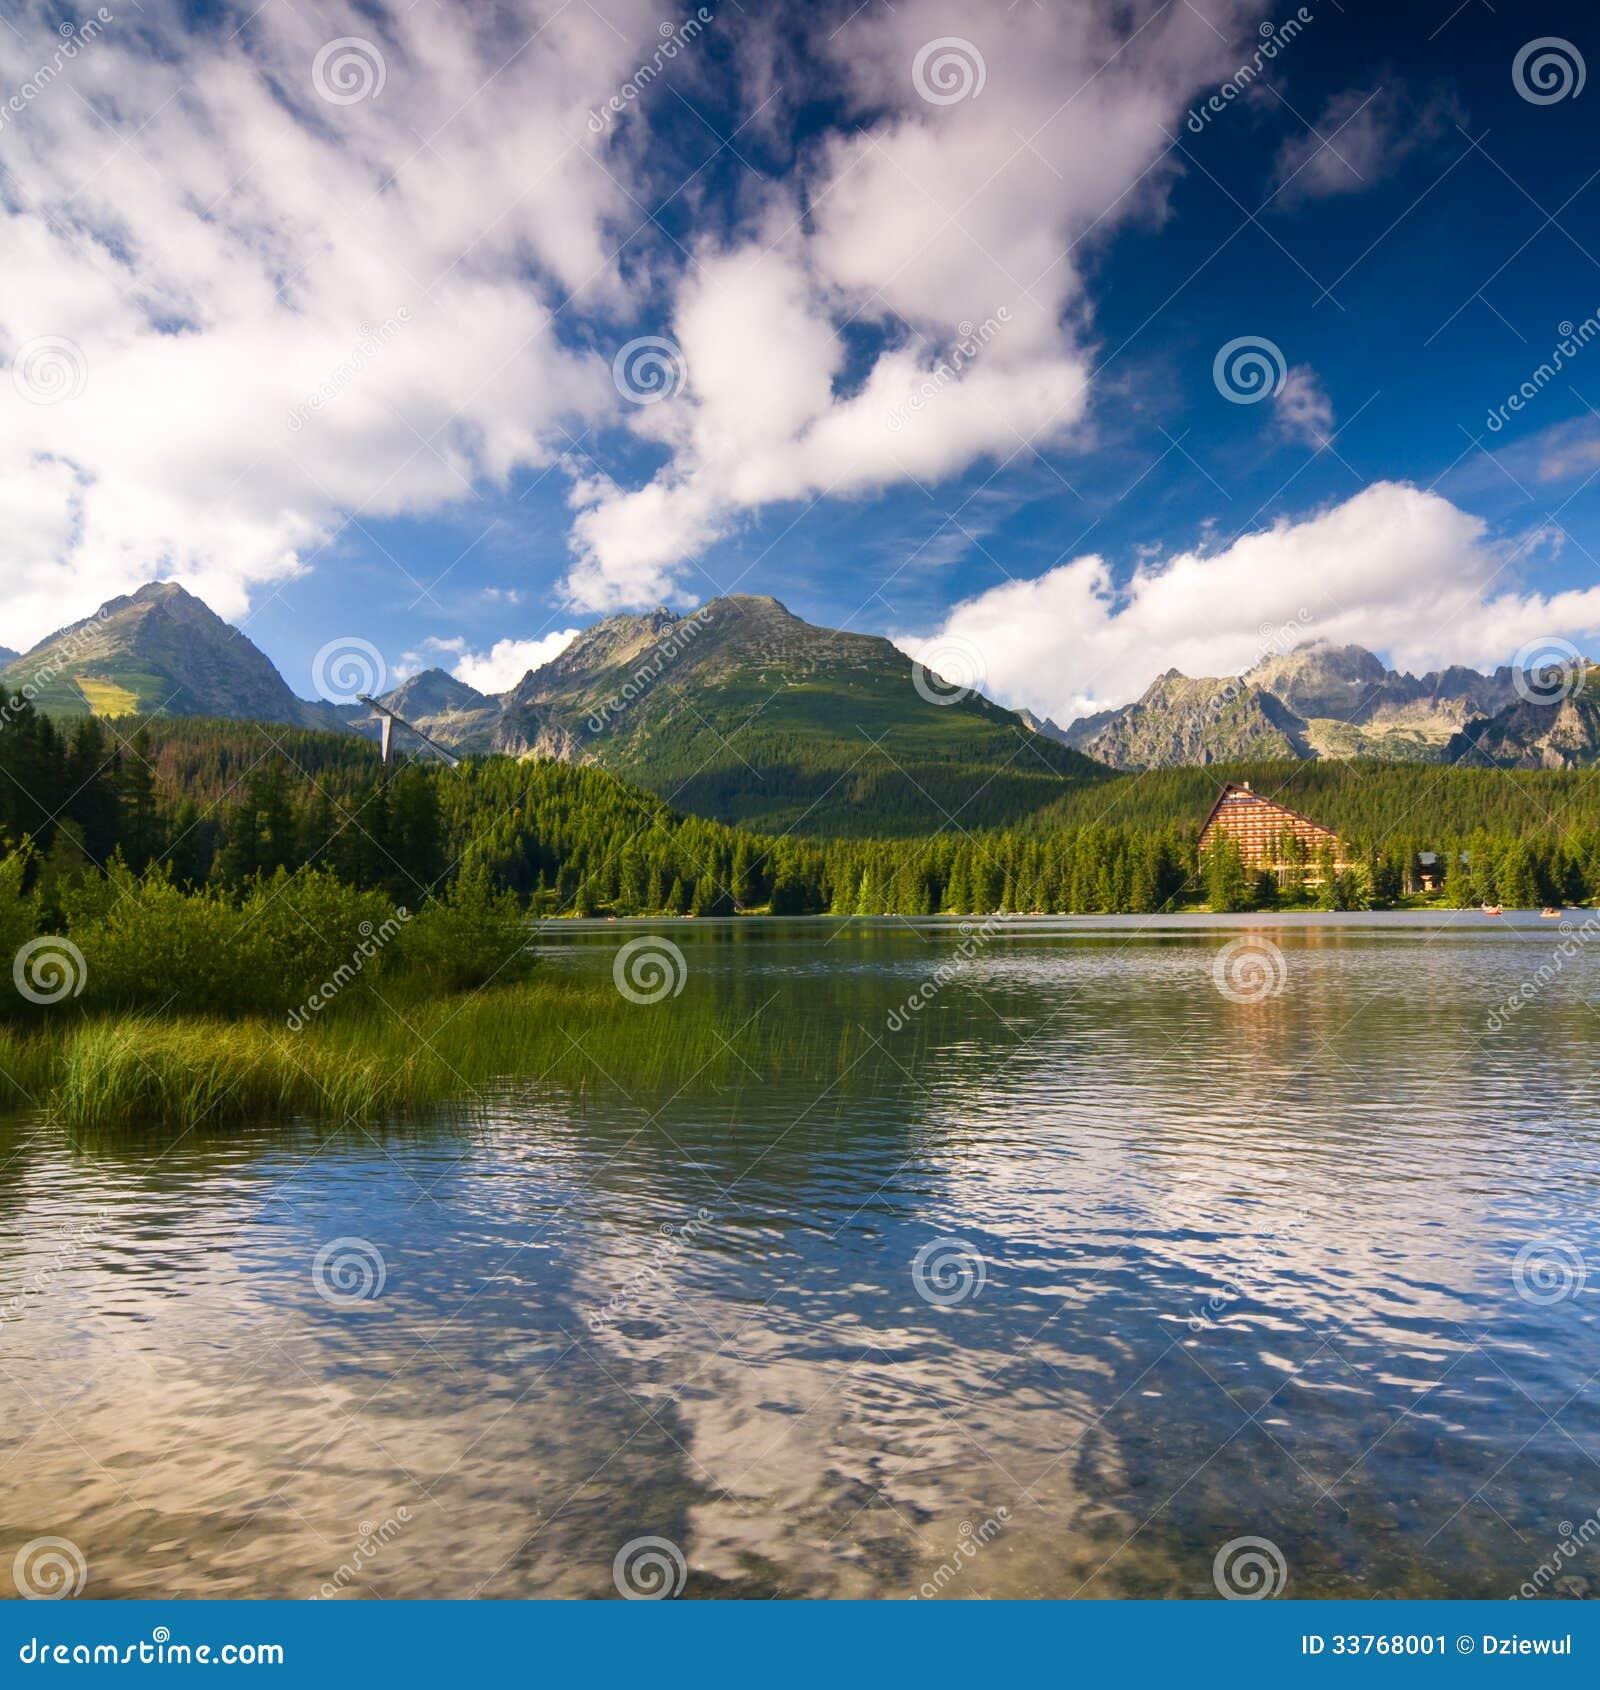 strbske Pleso Slovakia  city photos : Strbske Pleso, Lake In Slovakia Stock Image Image: 33768001